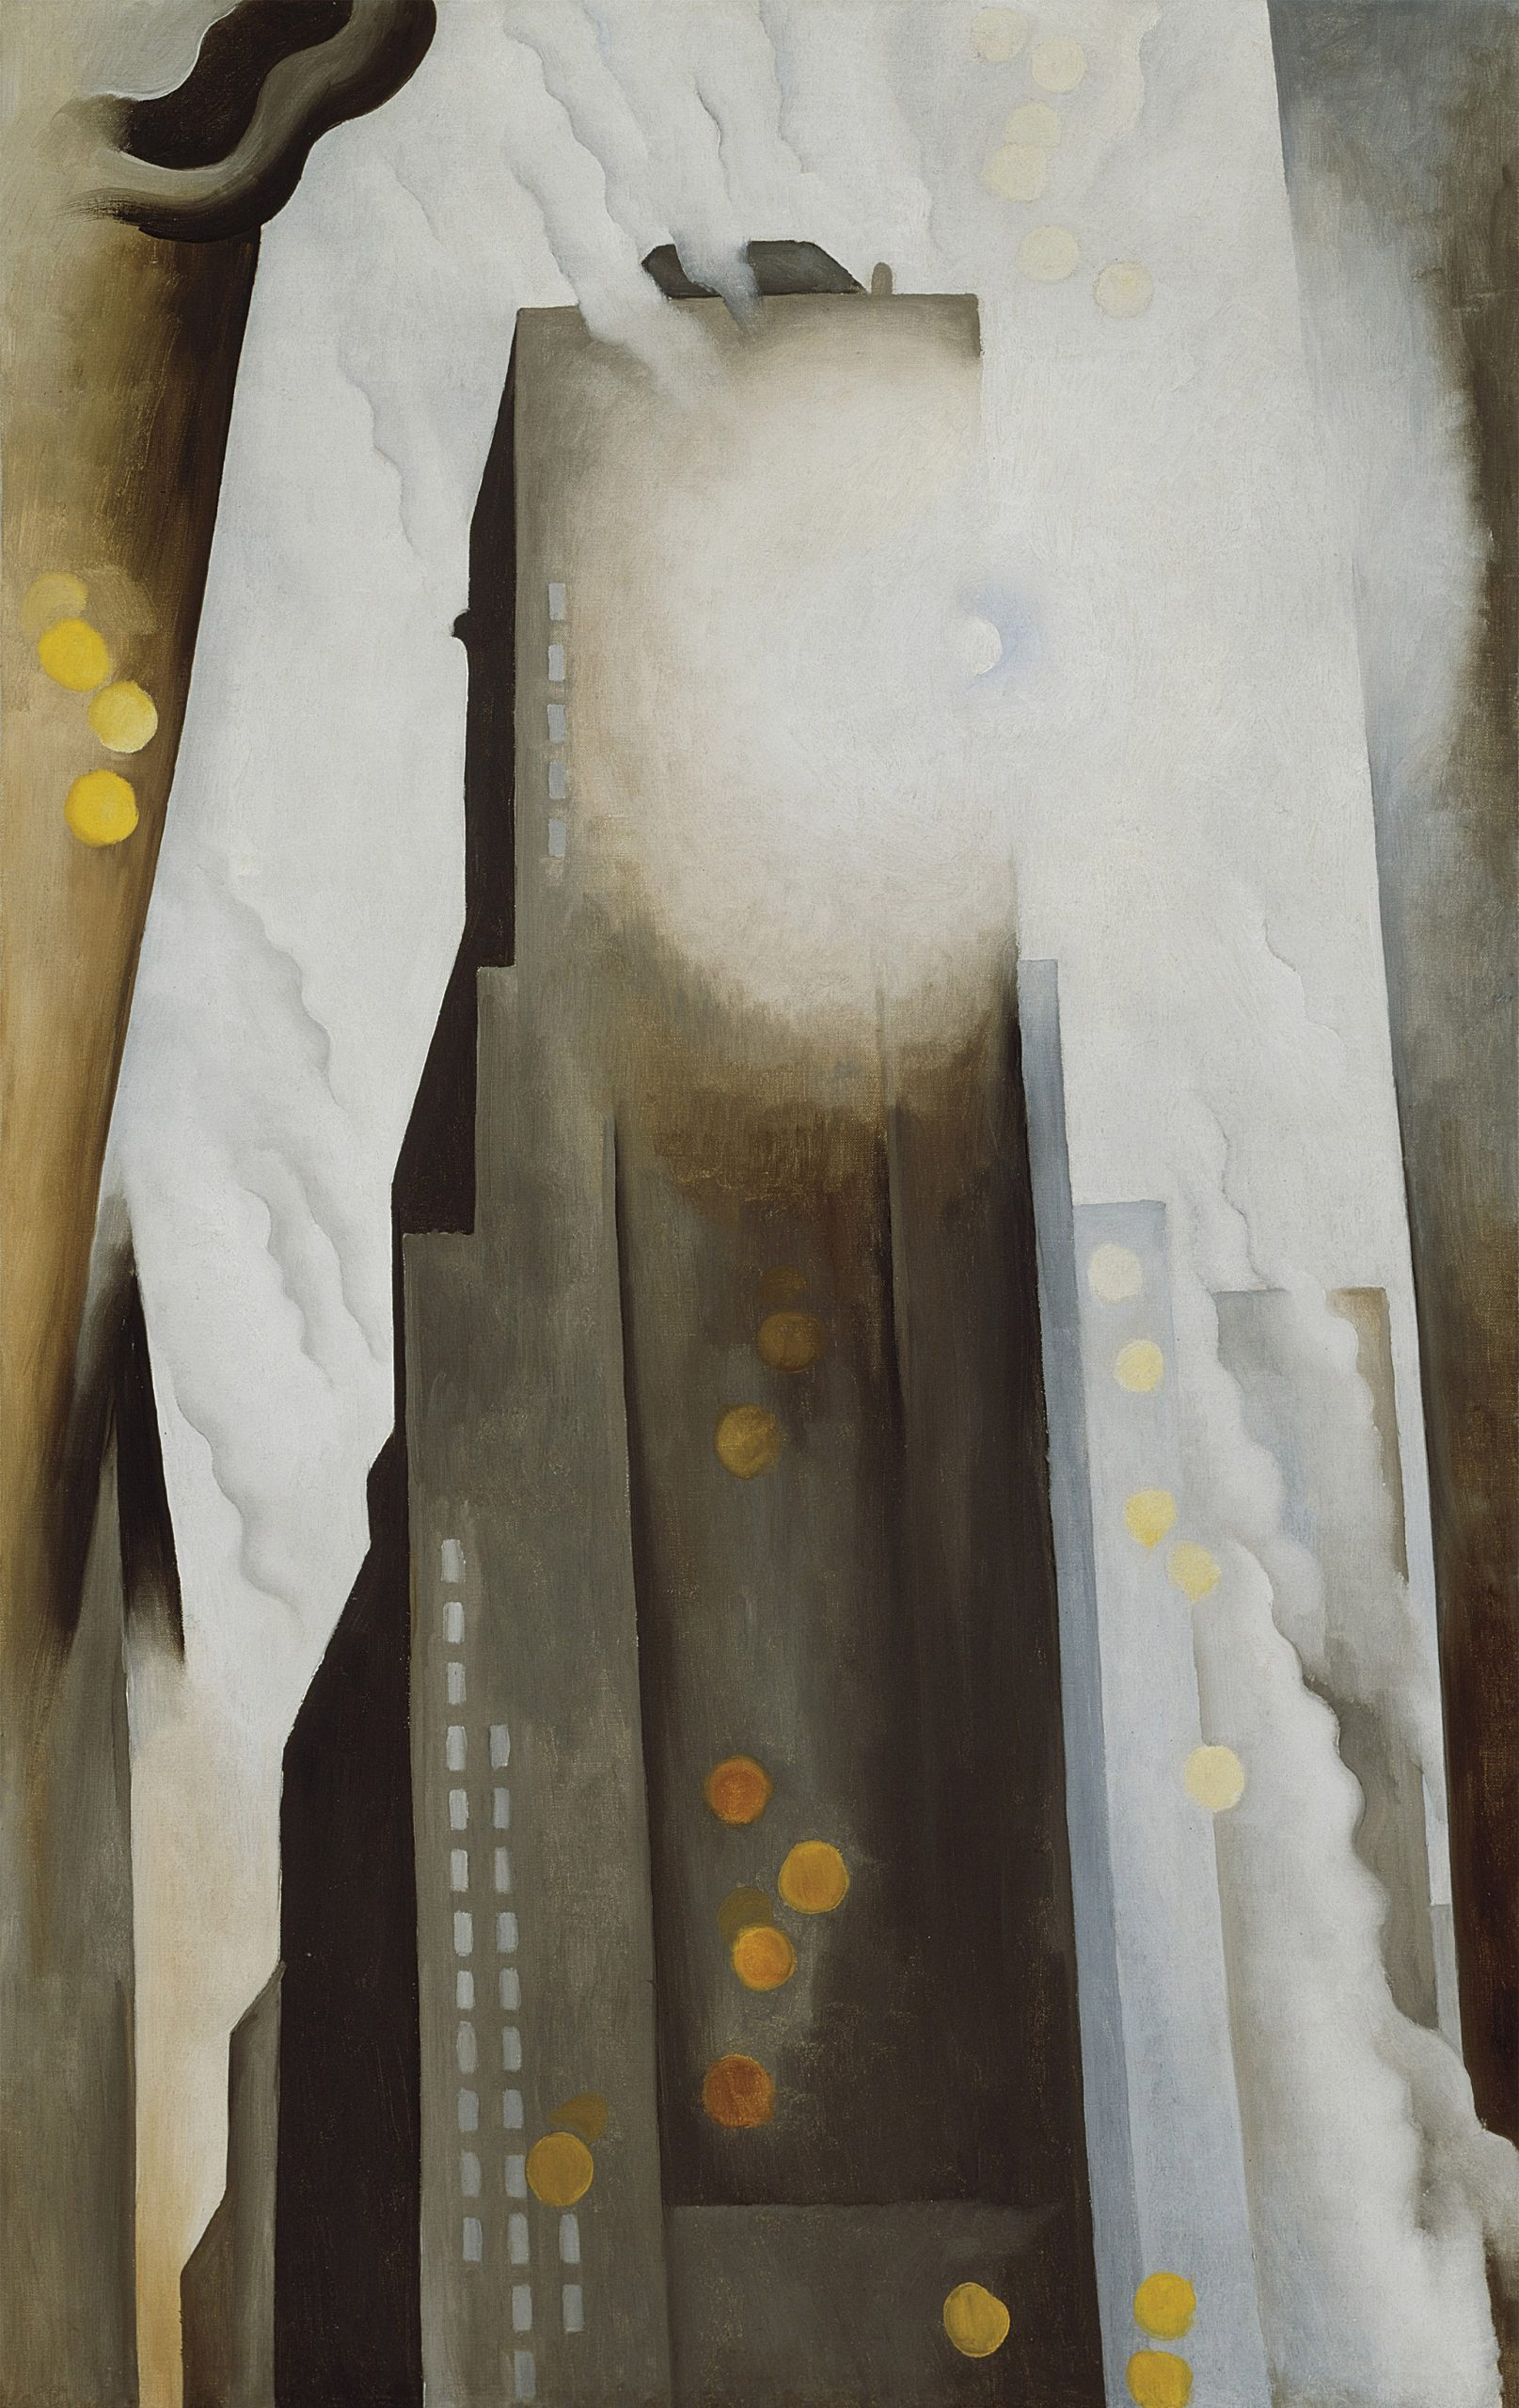 Georgia O'Keeffe,  The Shelton with Sunspots, N.Y., 1926 Huile sur toile, 123,2 × 76,8 cm The Art Institute of Chicago IL, USA © Art Institute of Chicago /Gift of Leigh B. Block/Bridgeman Images © Georgia O'Keeffe Museum / Adagp, Paris, 2021